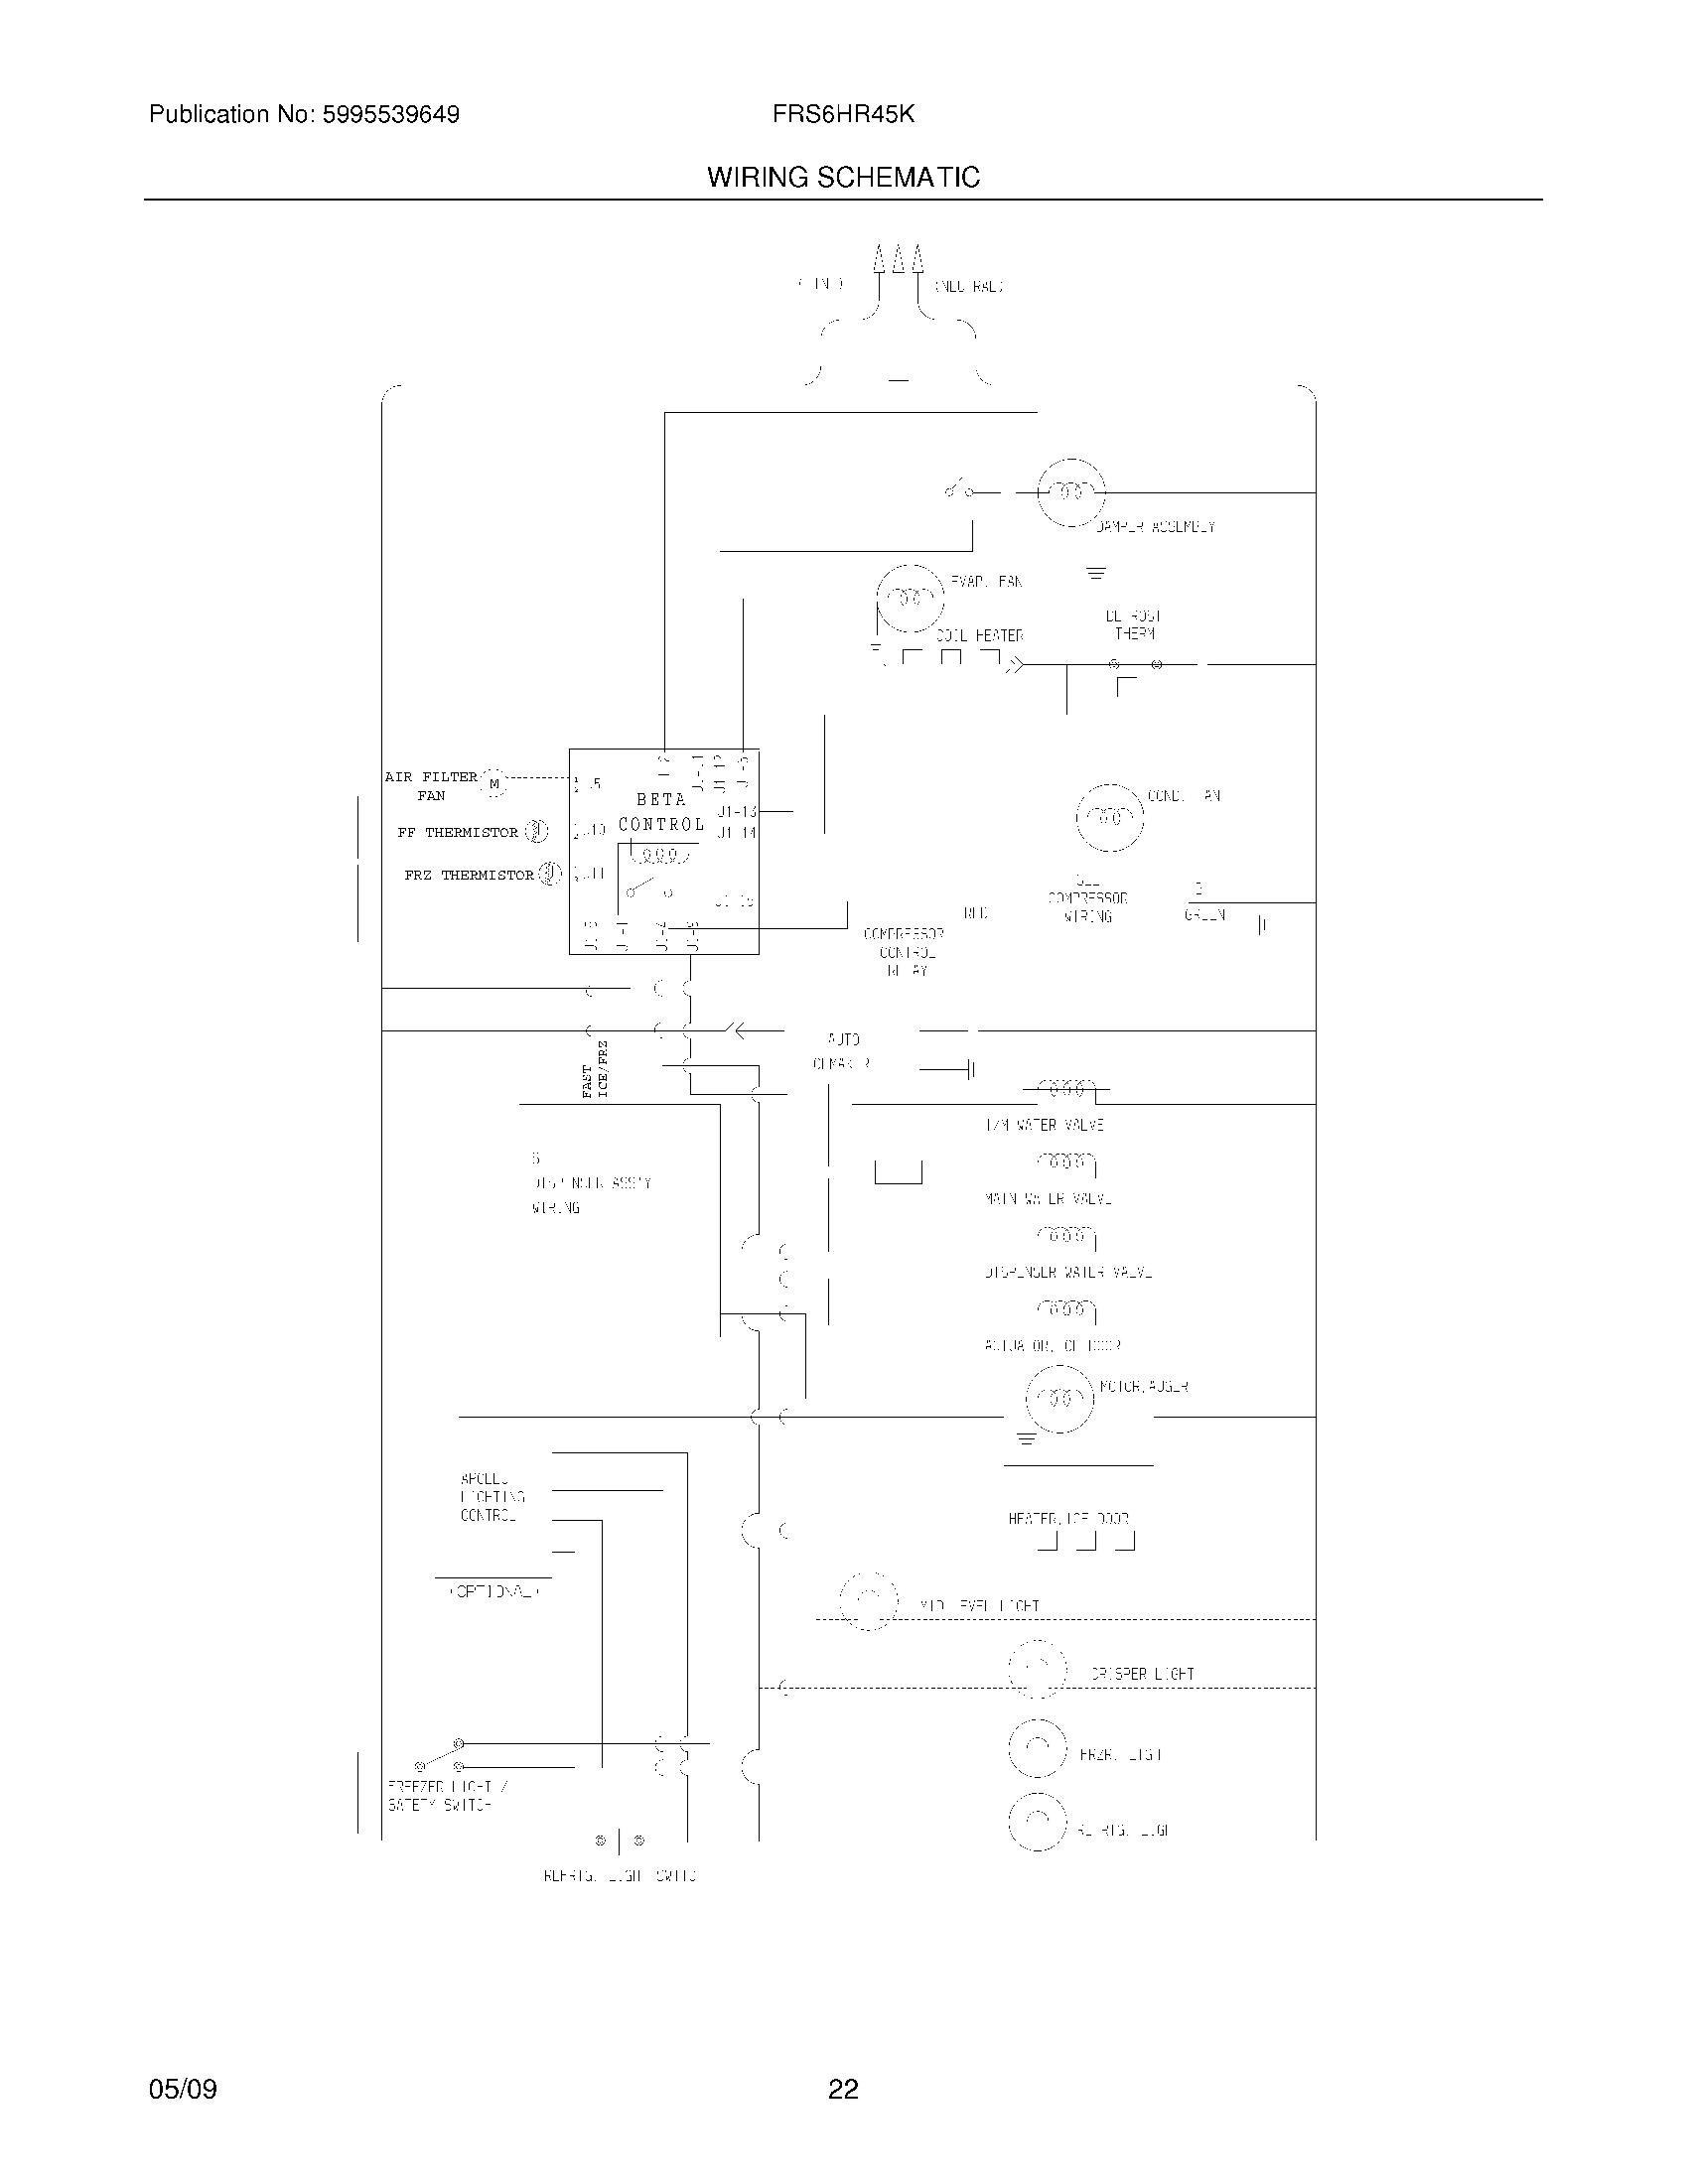 frs6hr45ks0 refrigerator wiring diagram for frigidaire model hr free printable wiring